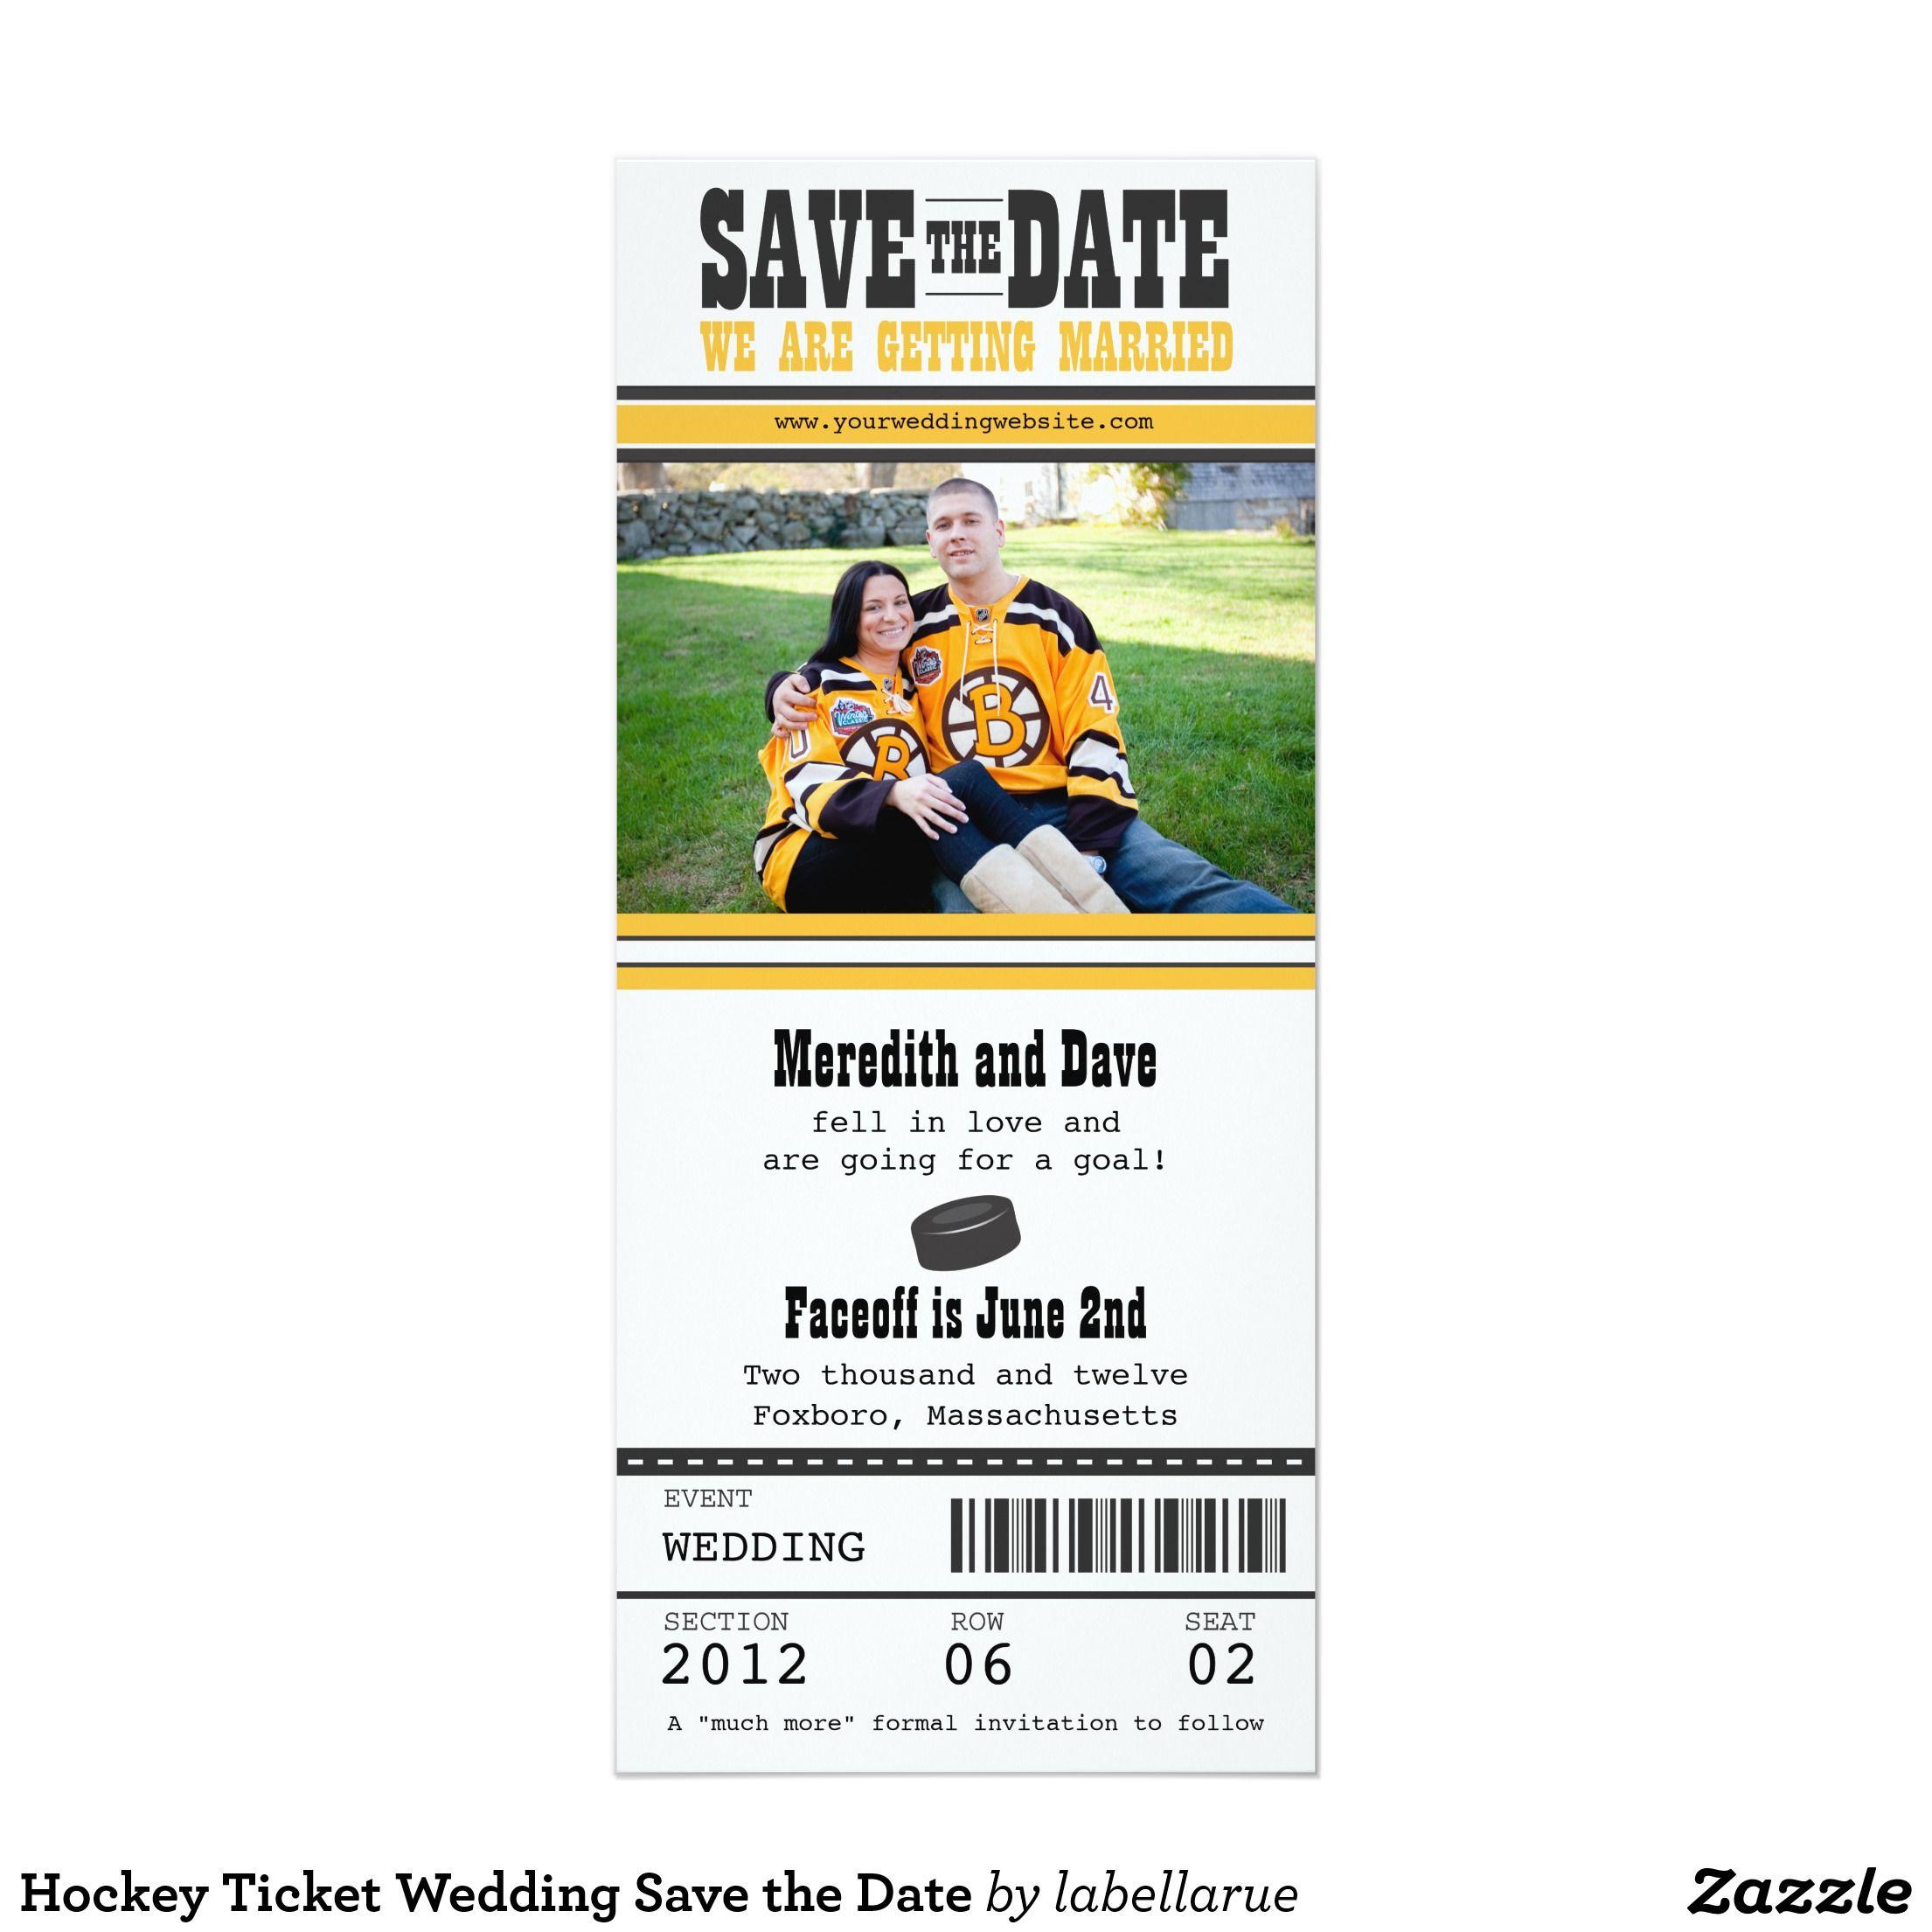 Hockey Ticket Wedding Save the Date Card   Wedding ideas   Pinterest ...